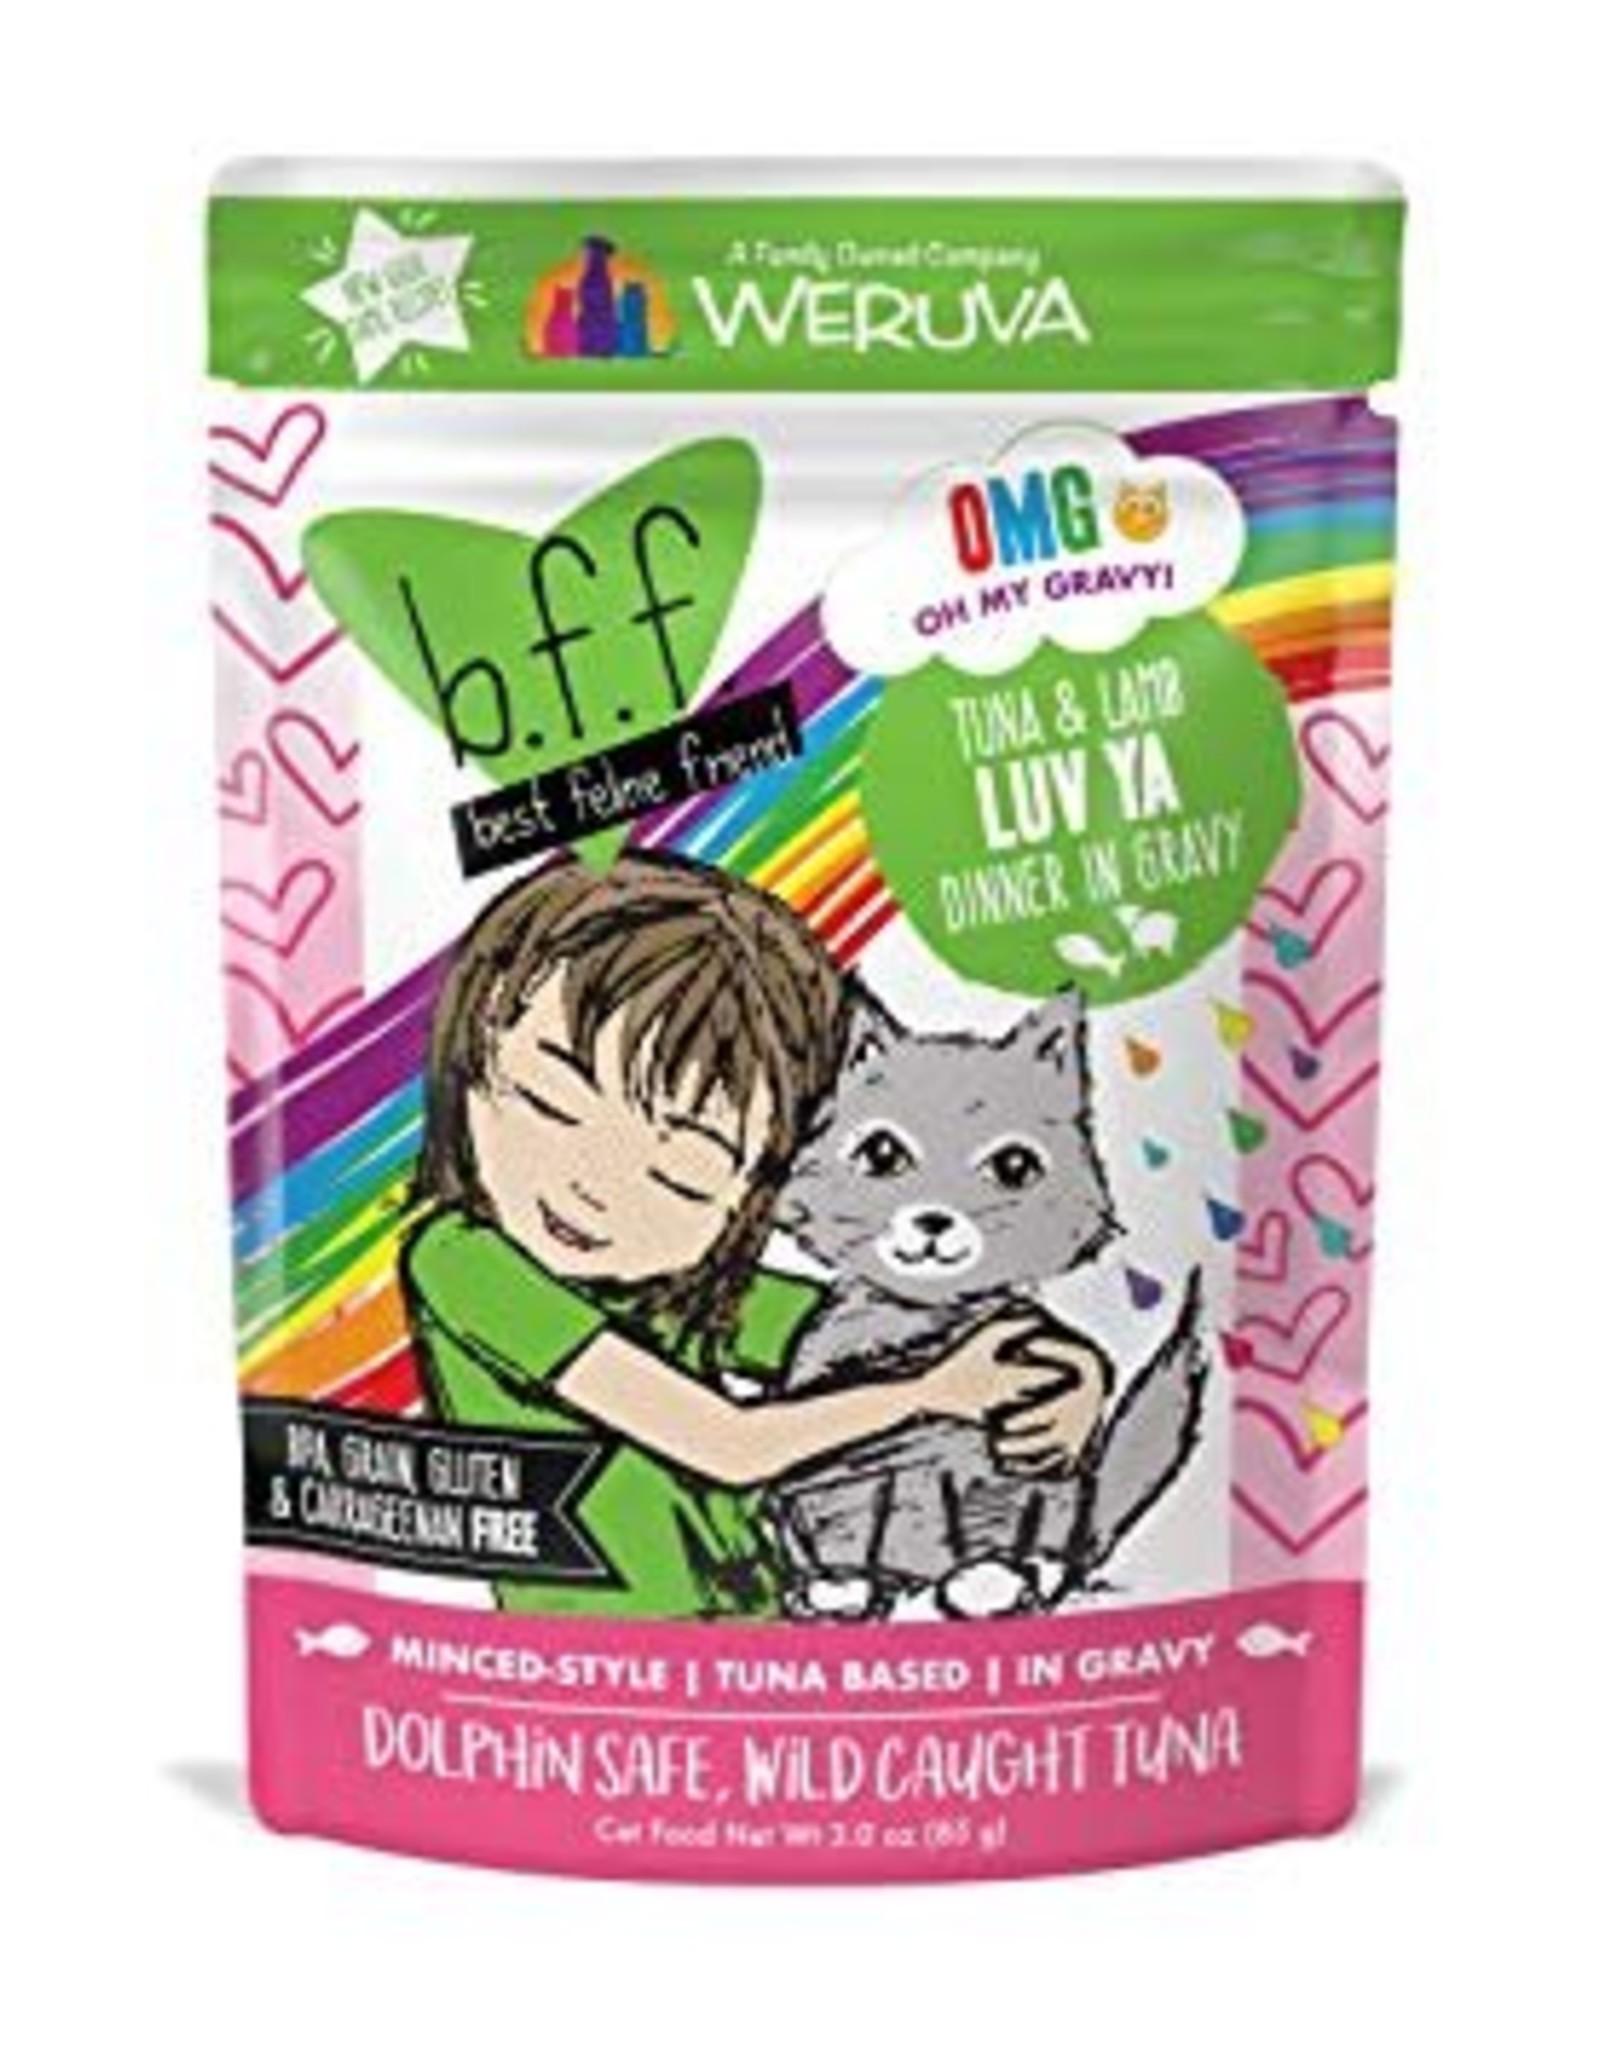 Weruva BFF OMG Tuna & Lamb Luv Ya Cat Food Pouch, 3 oz.